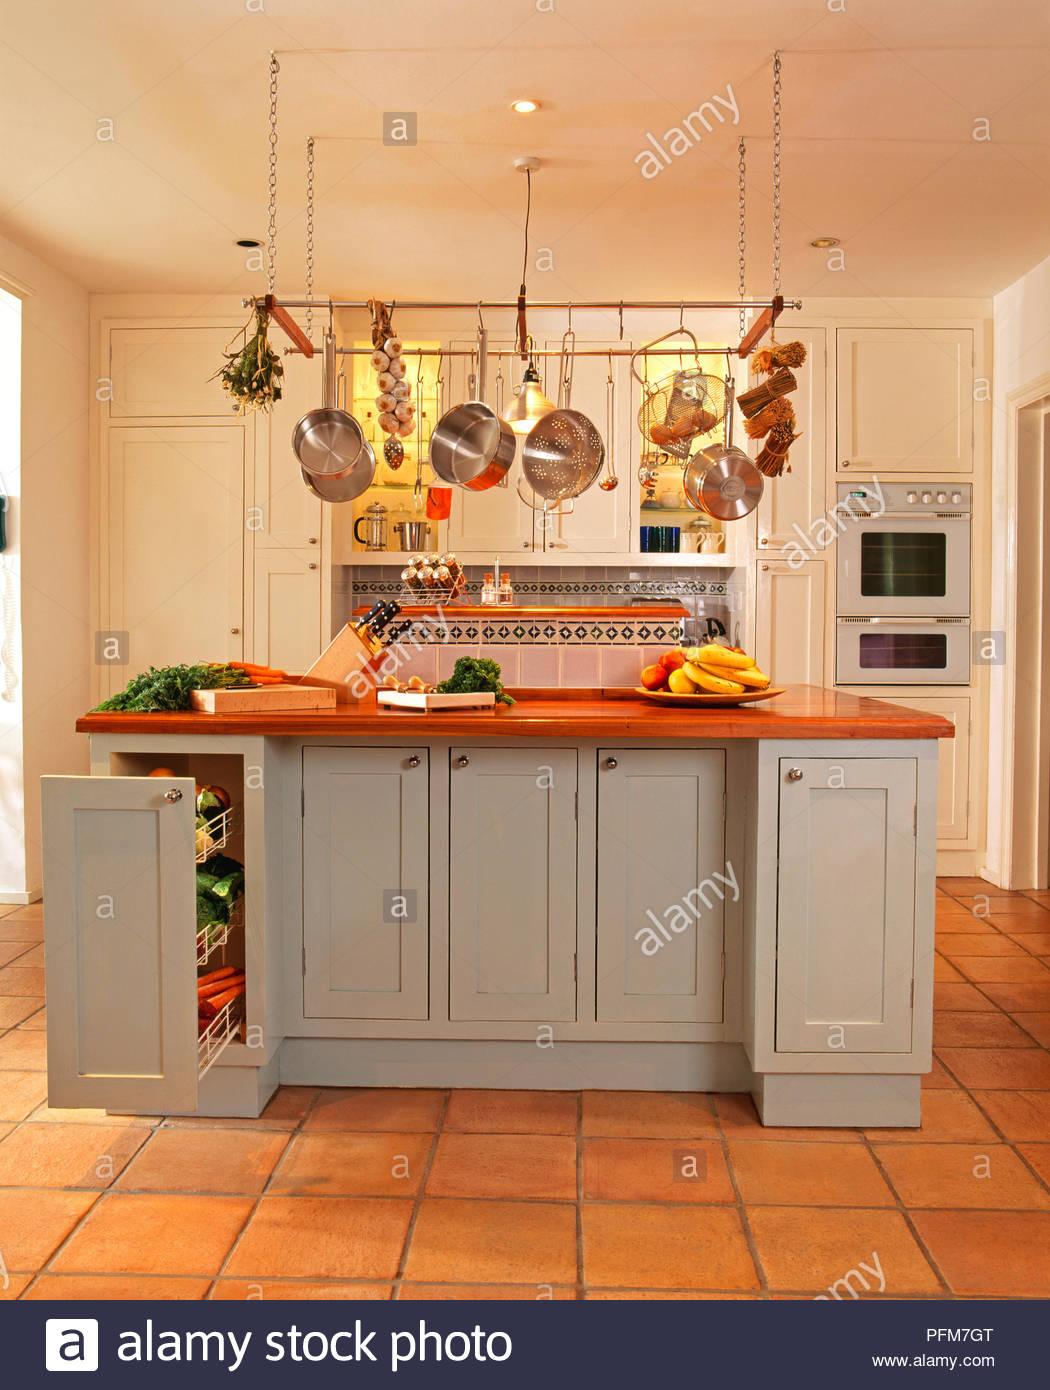 Full Size of Küche Freistehende Elemente Freistehende Küche Befestigen Freistehende Küchenelemente Freistehende Küche Selber Bauen Küche Freistehende Küche